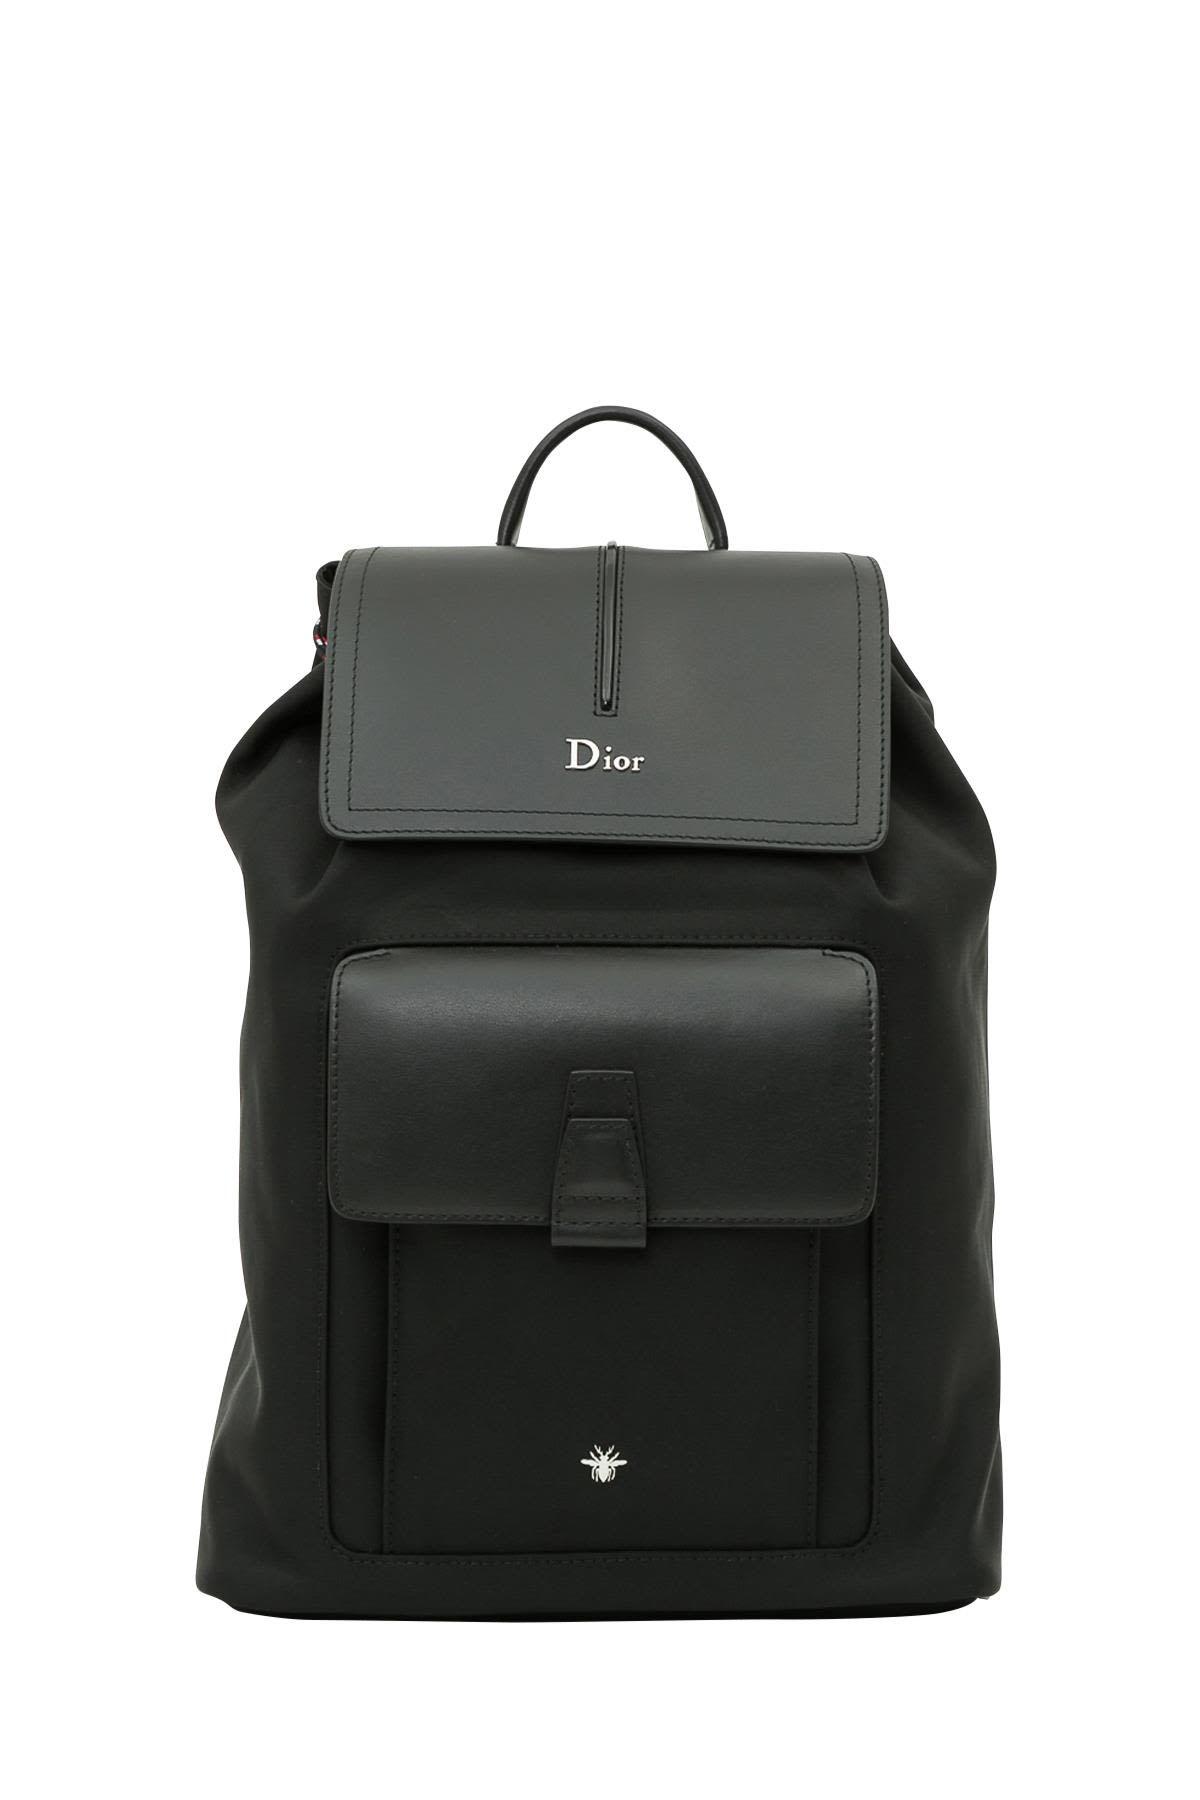 361e11d9df74 DIOR HOMME MINI MOTION RUCKSACK.  diorhomme  bags  shoulder bags  hand bags   nylon  cotton